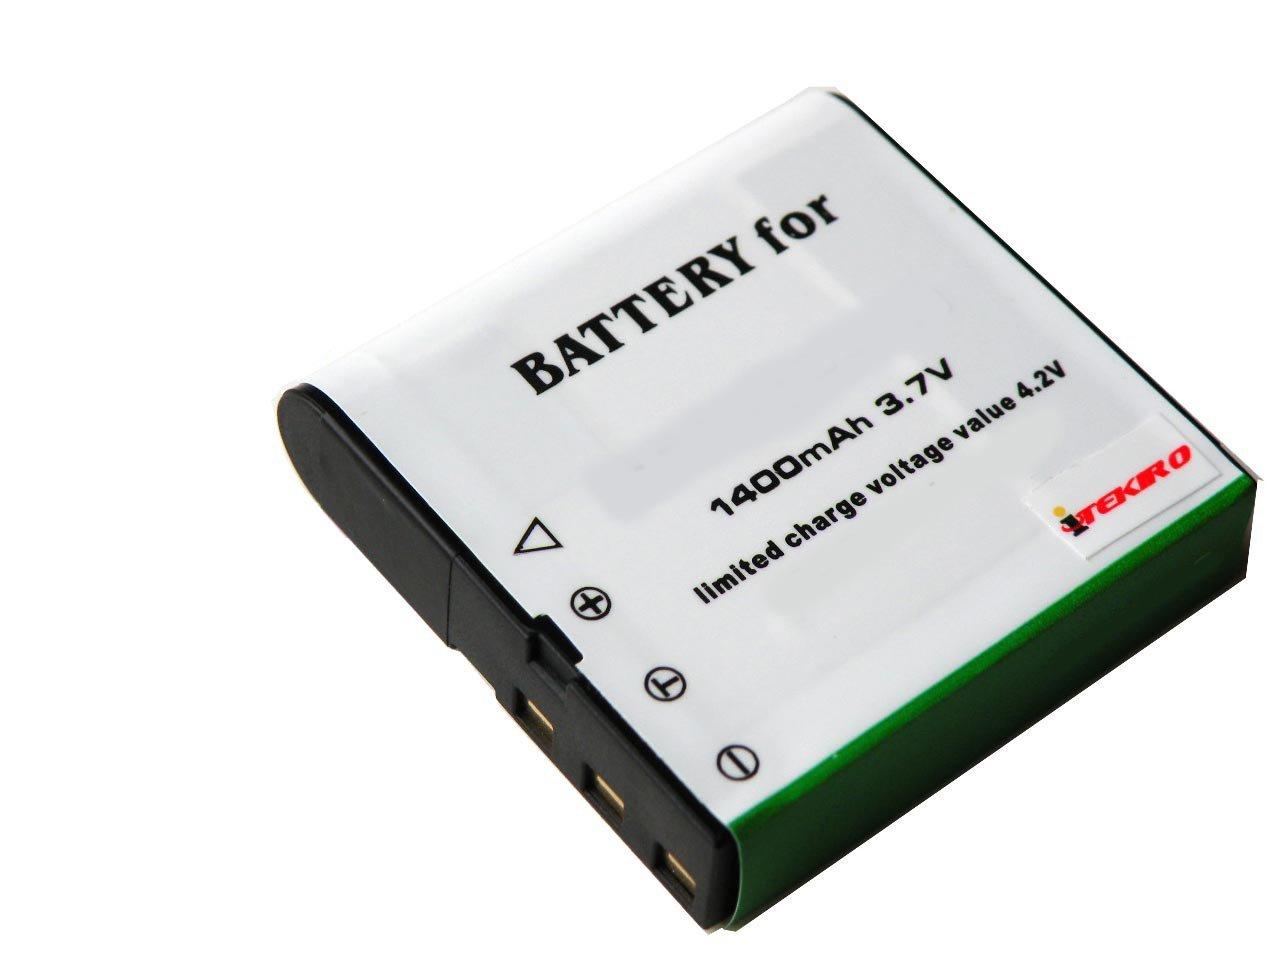 iTEKIRO 1400mAh Battery for DXG PAC-0040 DXG-125V DXG-125VR DXG-517V DXG-531V DXG-531VB DXG-531VK DXG-531VR DXG-532V DXG-532VB DXG-532VP DXG-532VV DXG-533V DXG-534V DXG-534VR DXG-534VS DXG-534VW DXG-535V DXG-535VB DXG-535VR DXG-535VW DXG-566V DXG-571V DXG-580V DXG-580VBL DXG-5B1V DXG-5B1VO